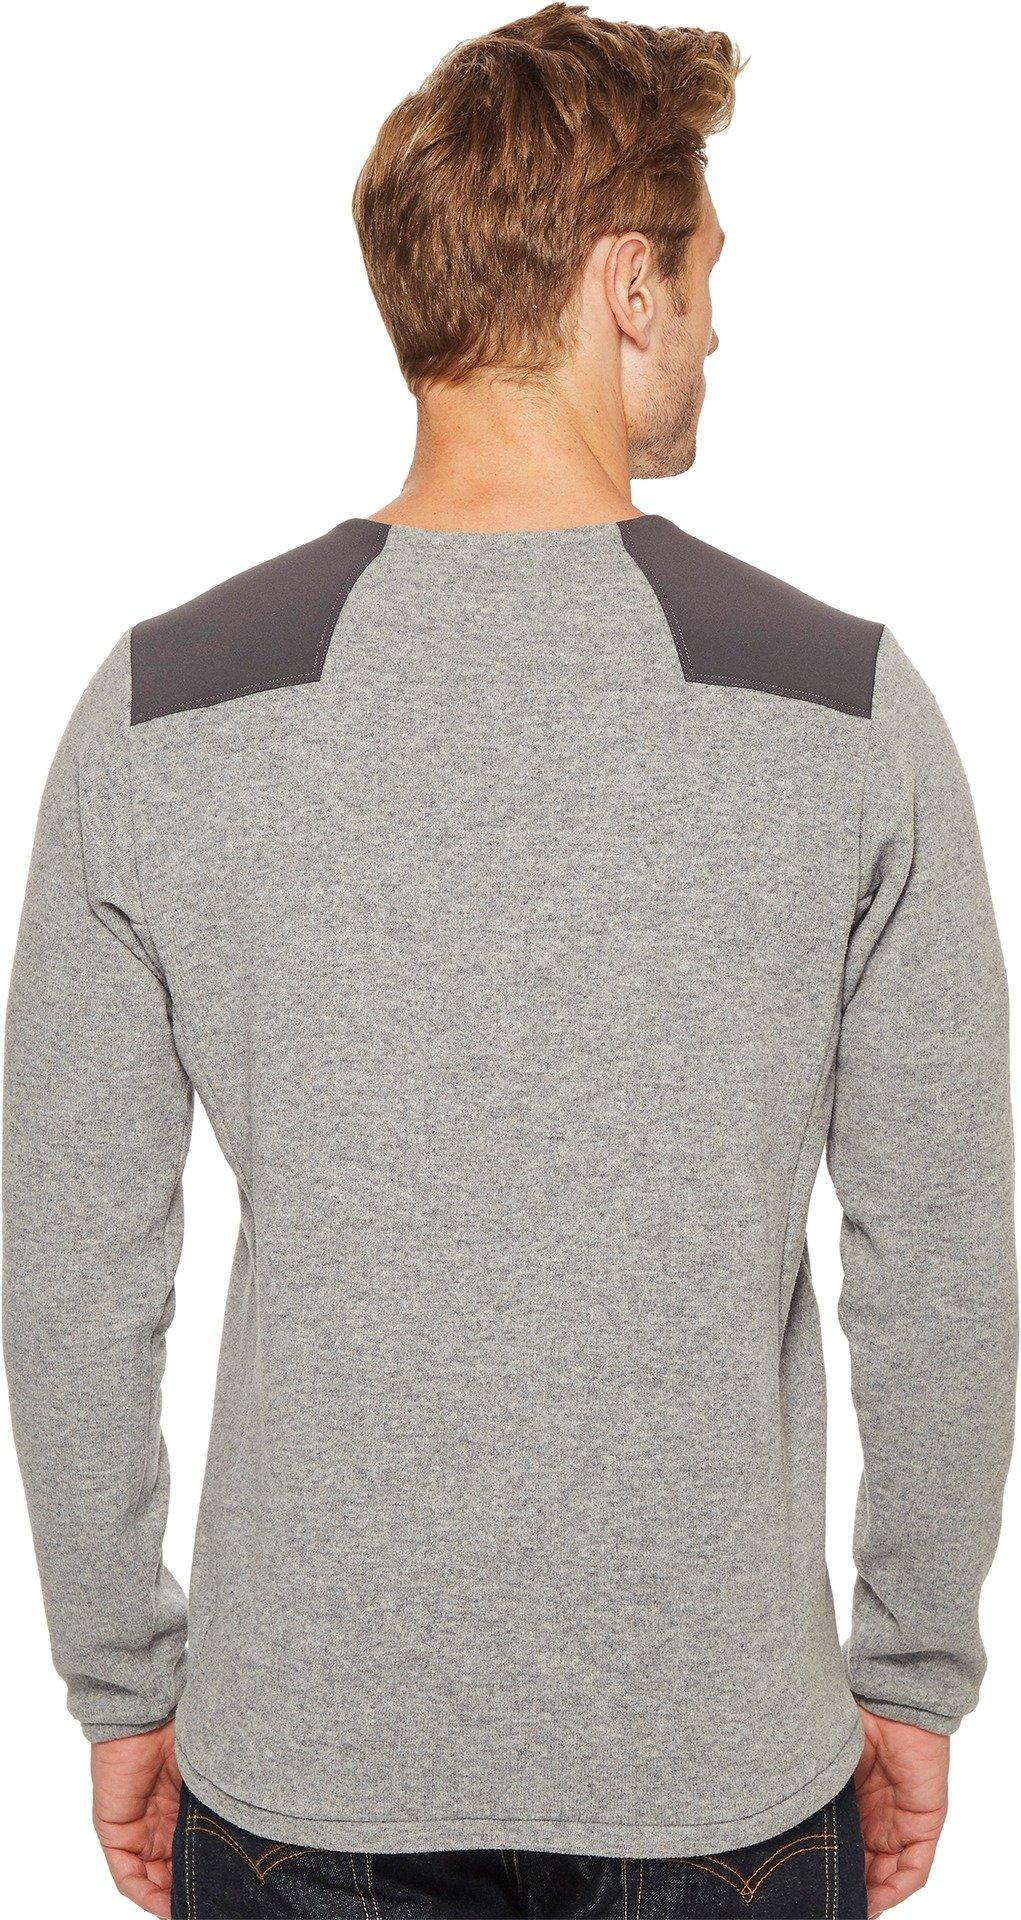 Arc'teryx Donavan Crew Neck Sweater - Men's Light Grey Heather, L by Arc'teryx (Image #3)